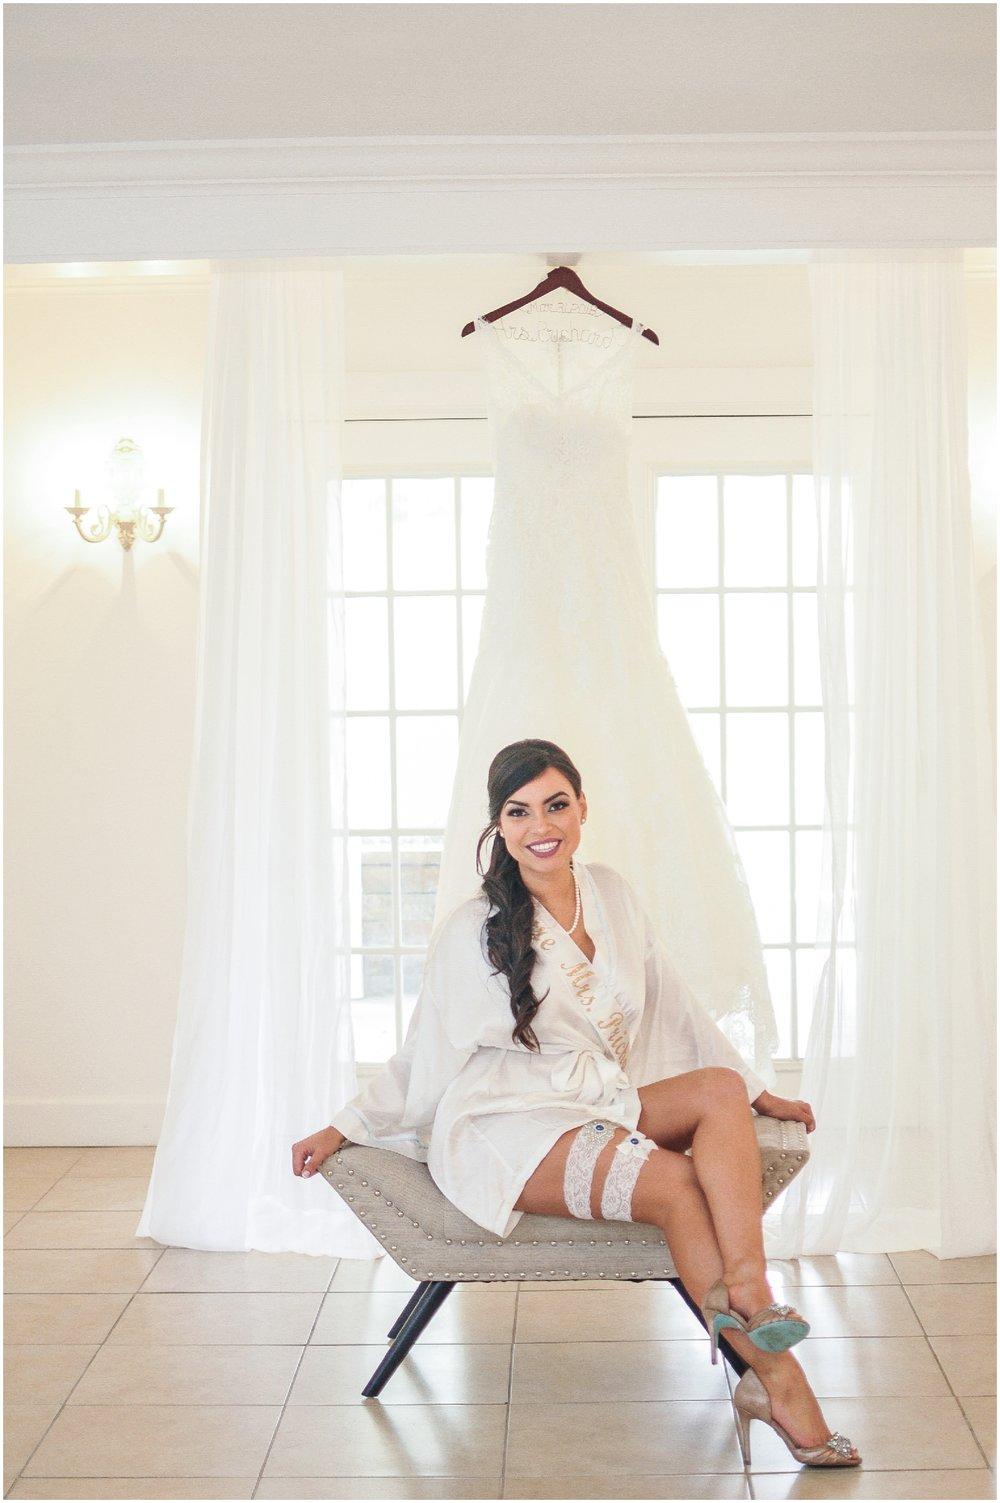 Rustic-Elegant-Wedding-Venue-in-Tampa-Stonebridge-Events_0414.jpg